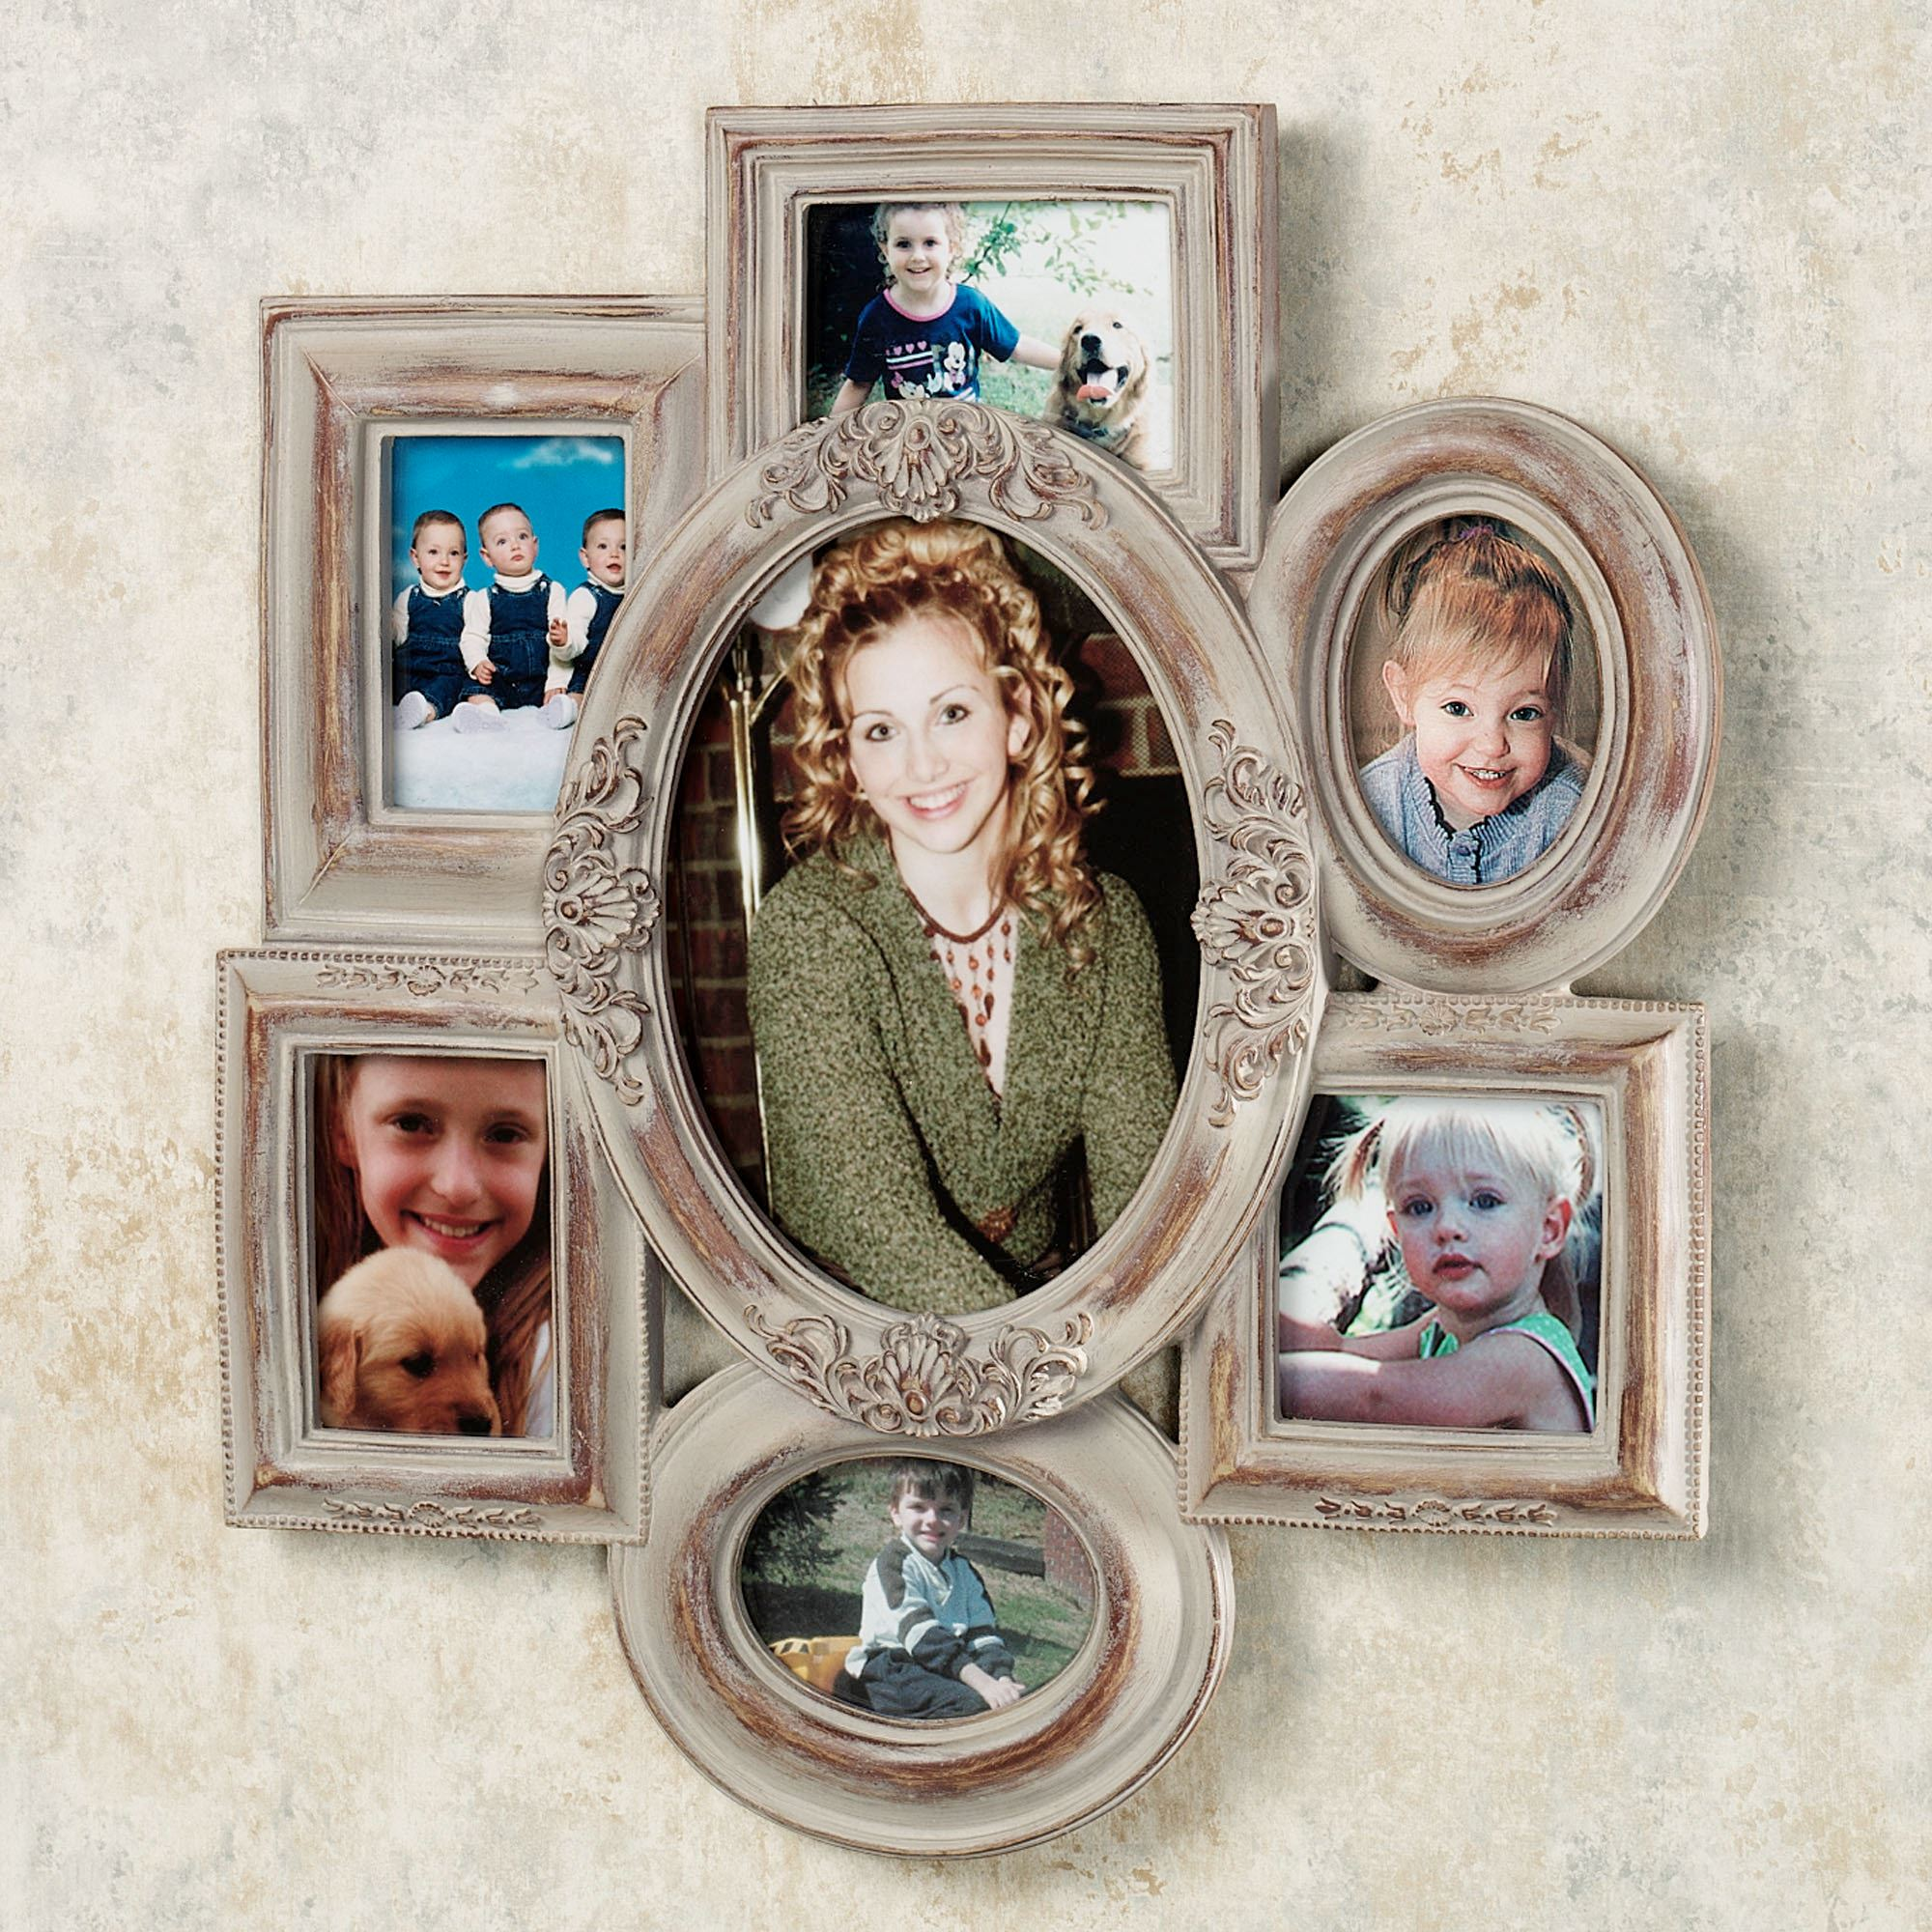 collage wall photo frame. Black Bedroom Furniture Sets. Home Design Ideas